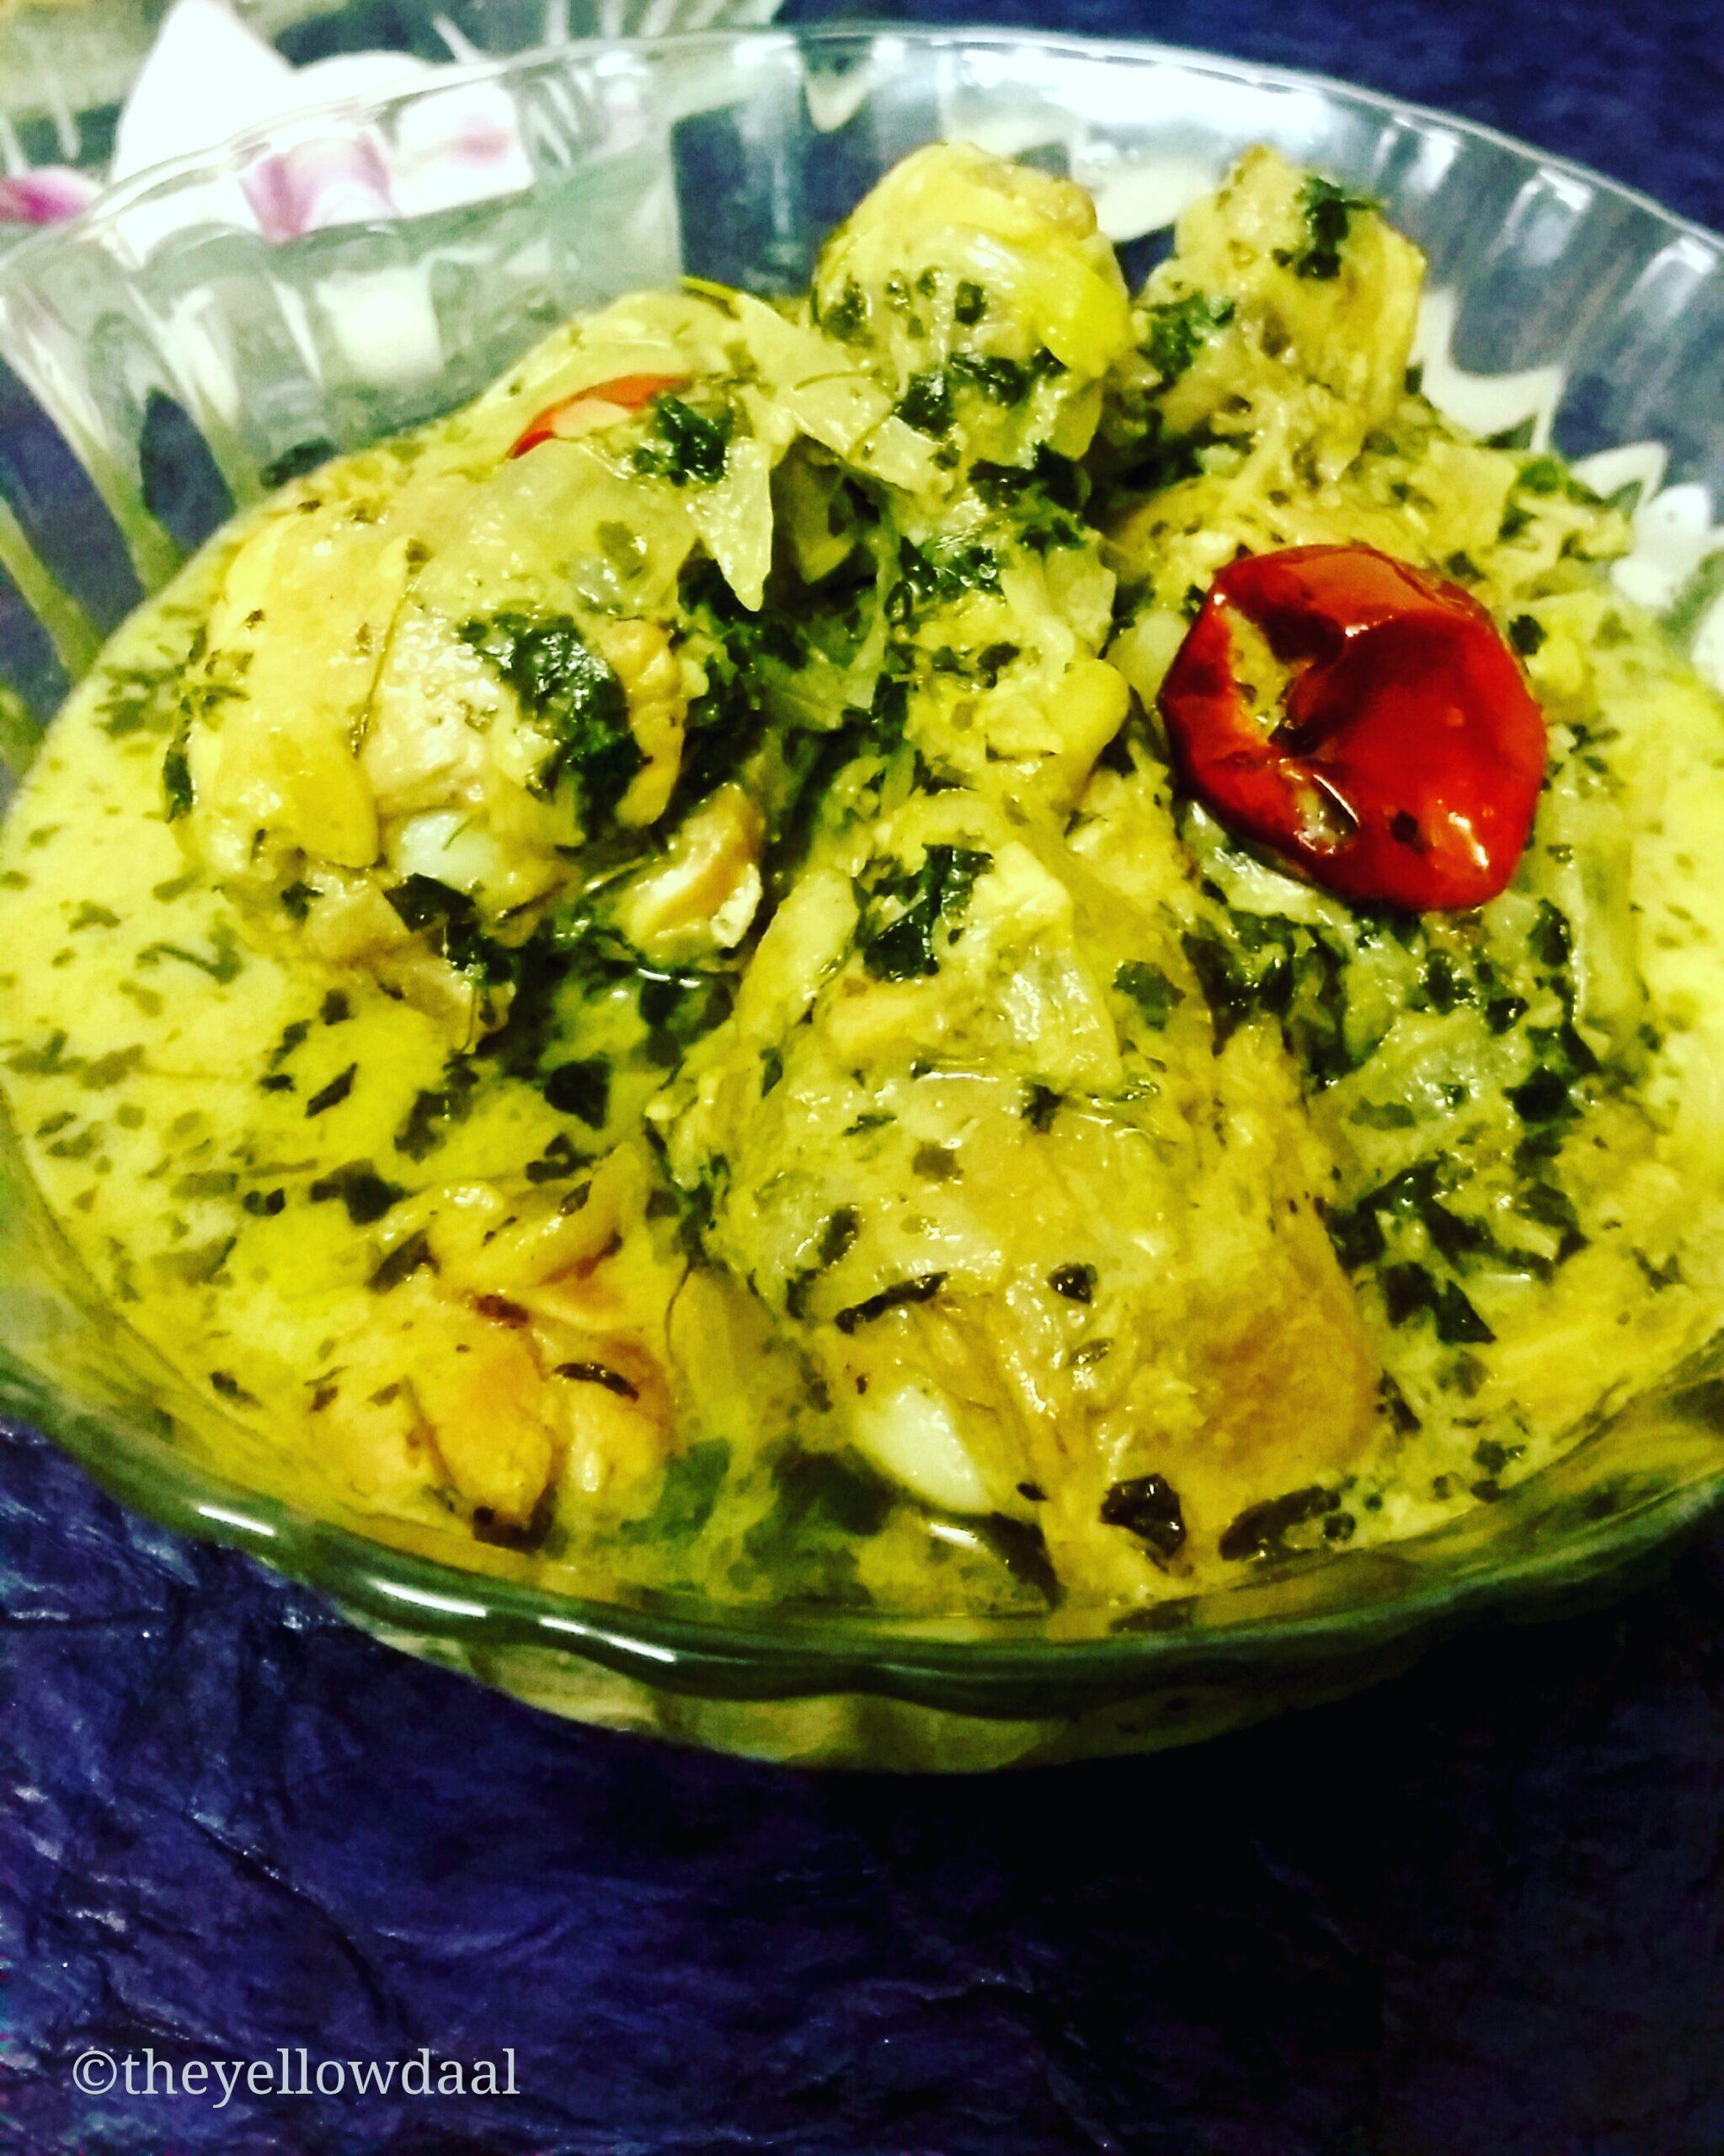 Methi-Malai-Murg-Chicken-In-Creamy-Fenugreek-Sauce